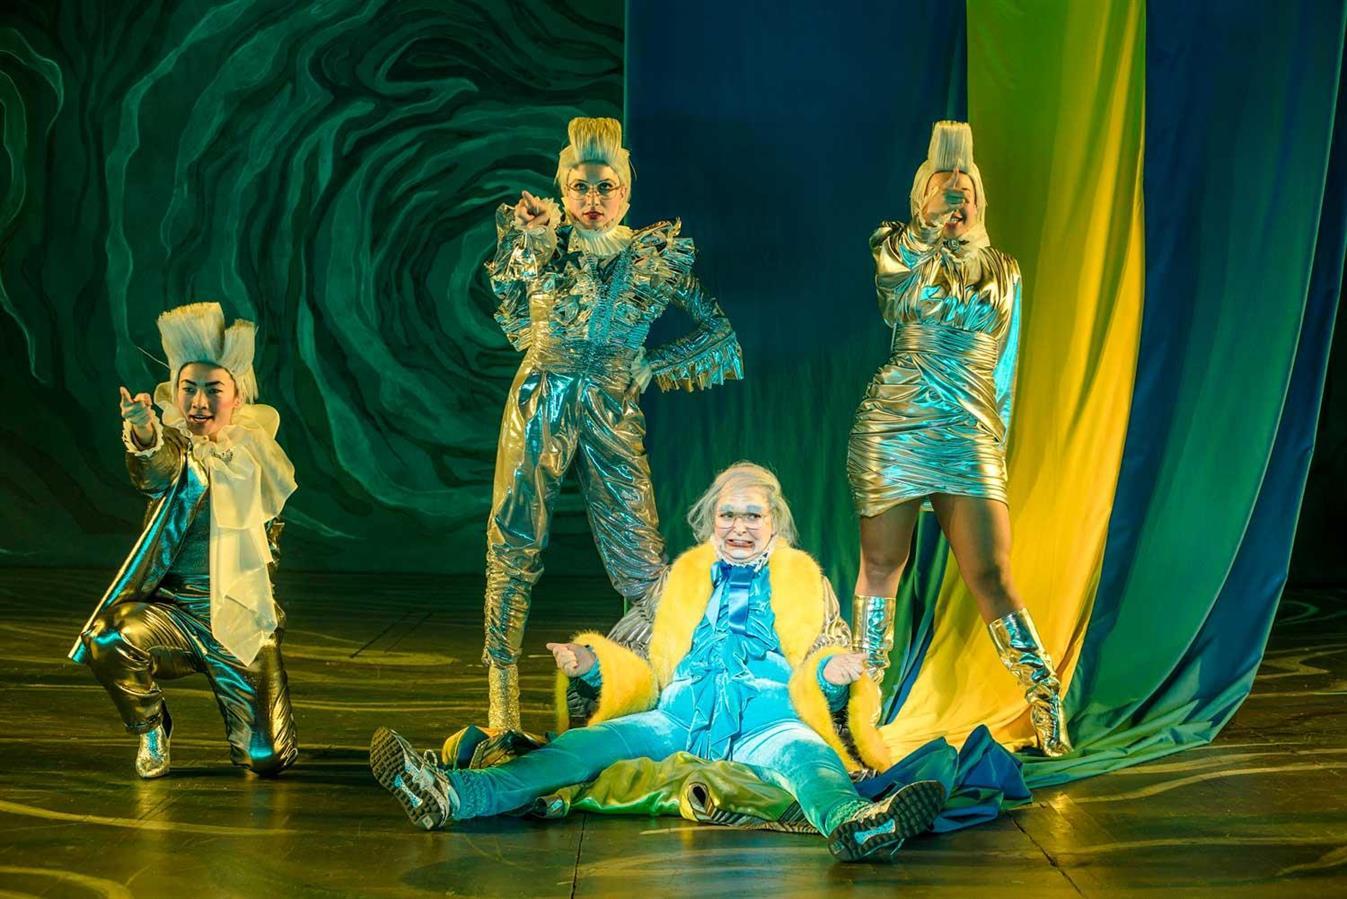 Tordenskjold - Trøndelag Teater - Director: Mads Bones - Costume Design: Christina Lovery - Foto: Erika Hebbert 2019